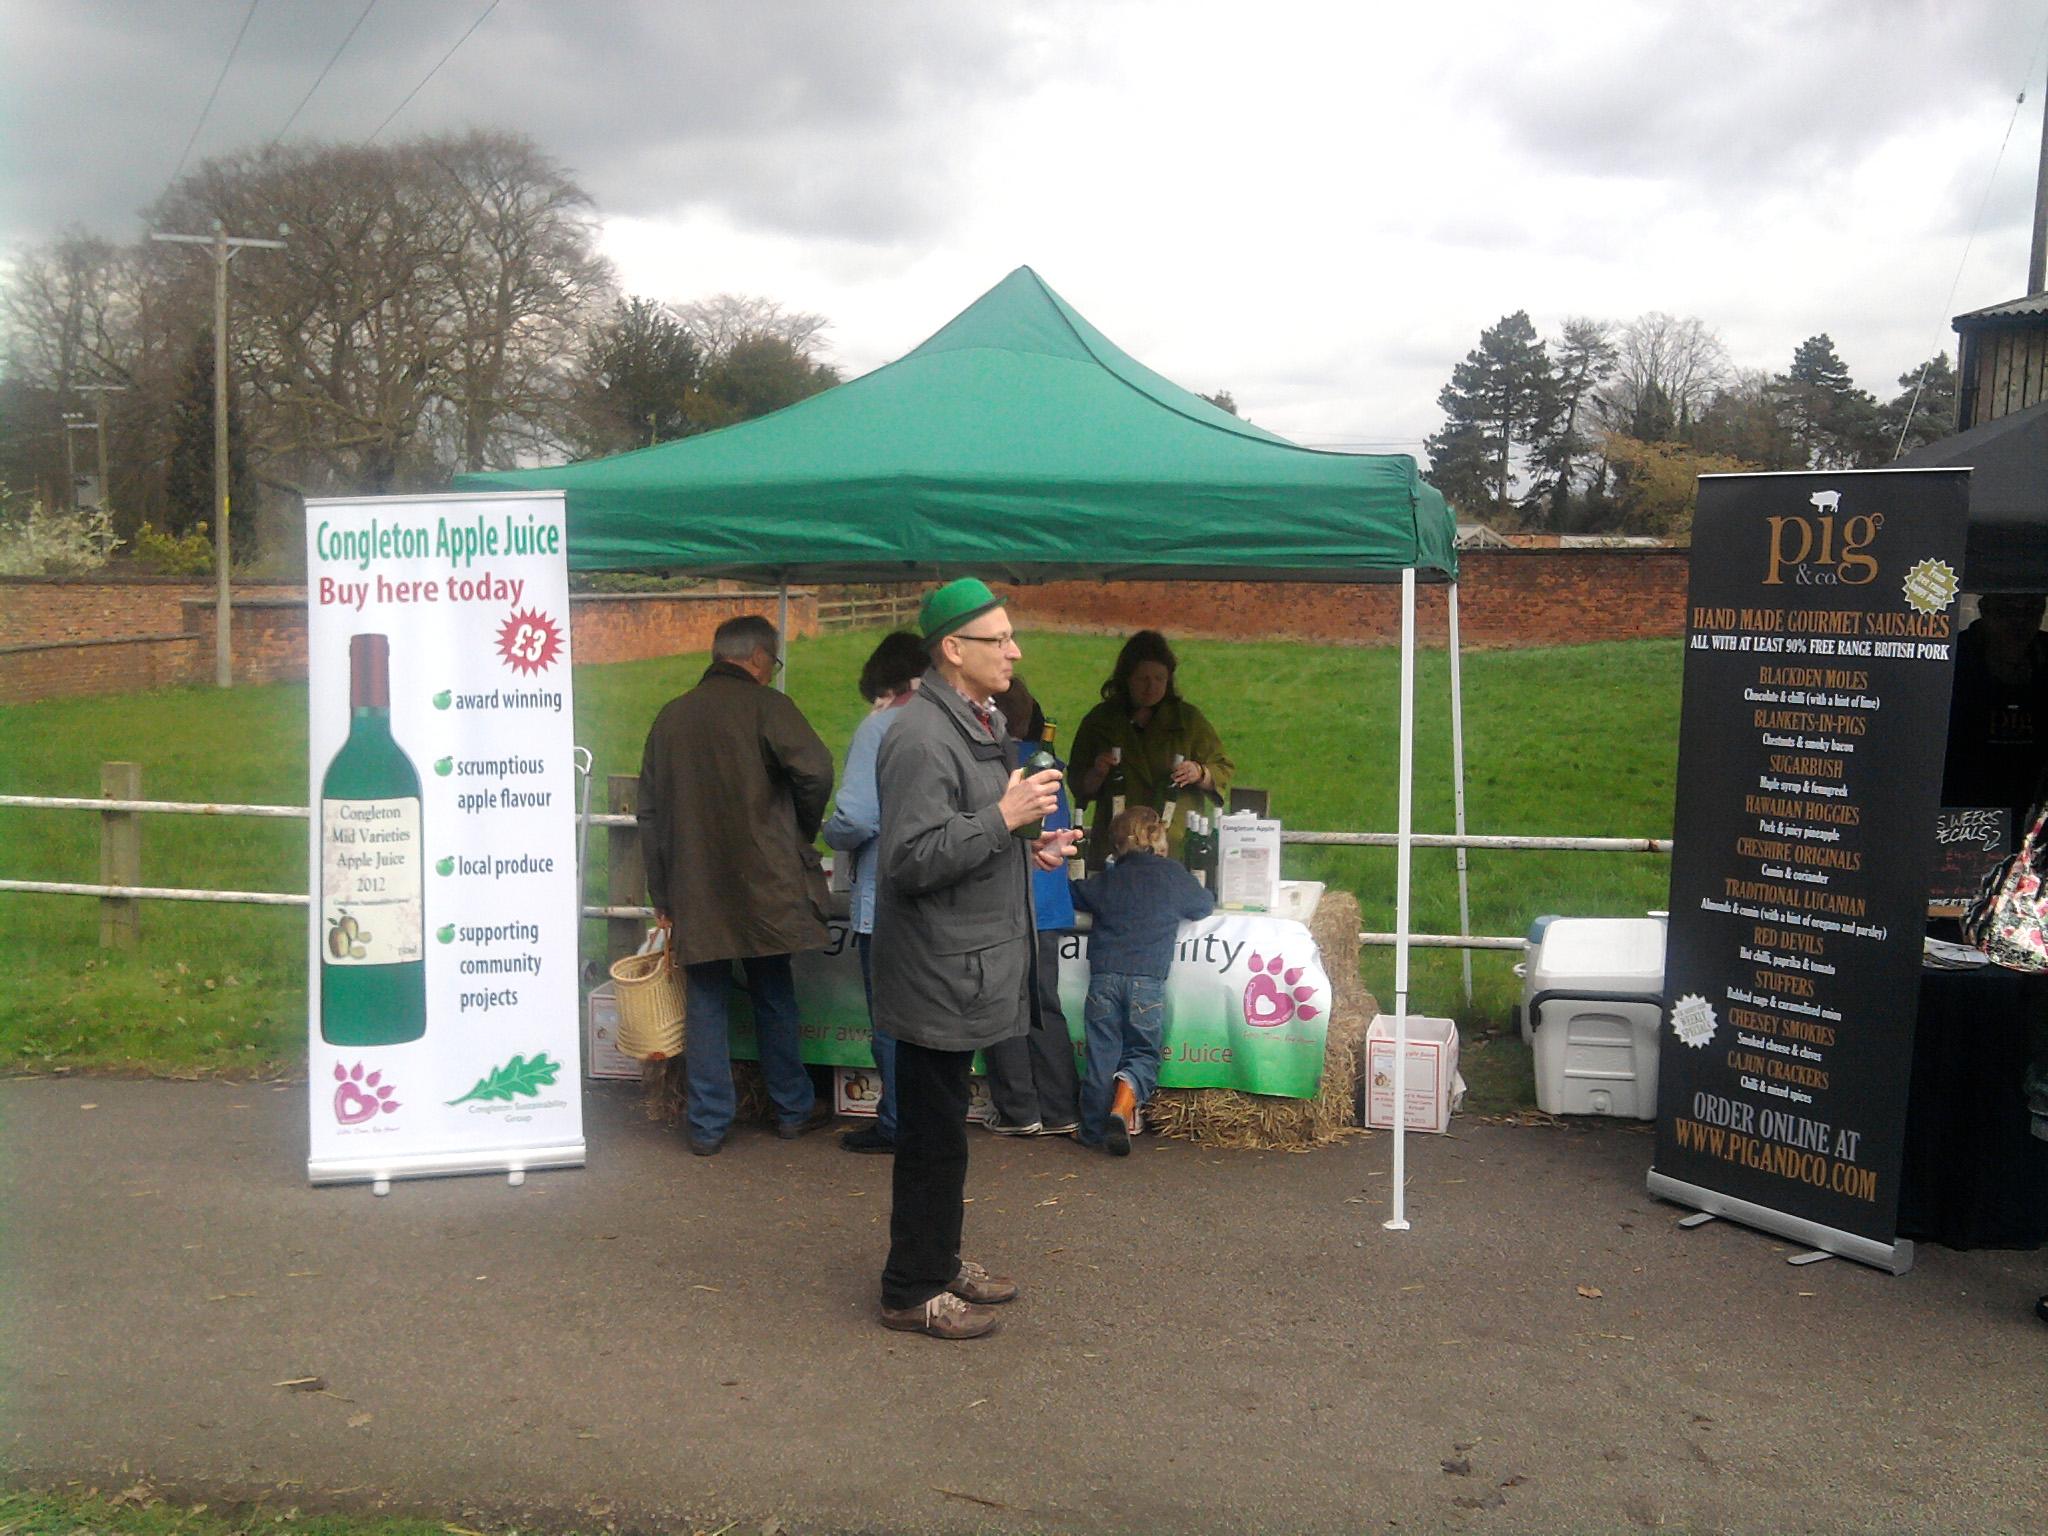 Rode Hall 2012 Selling Apple Juice